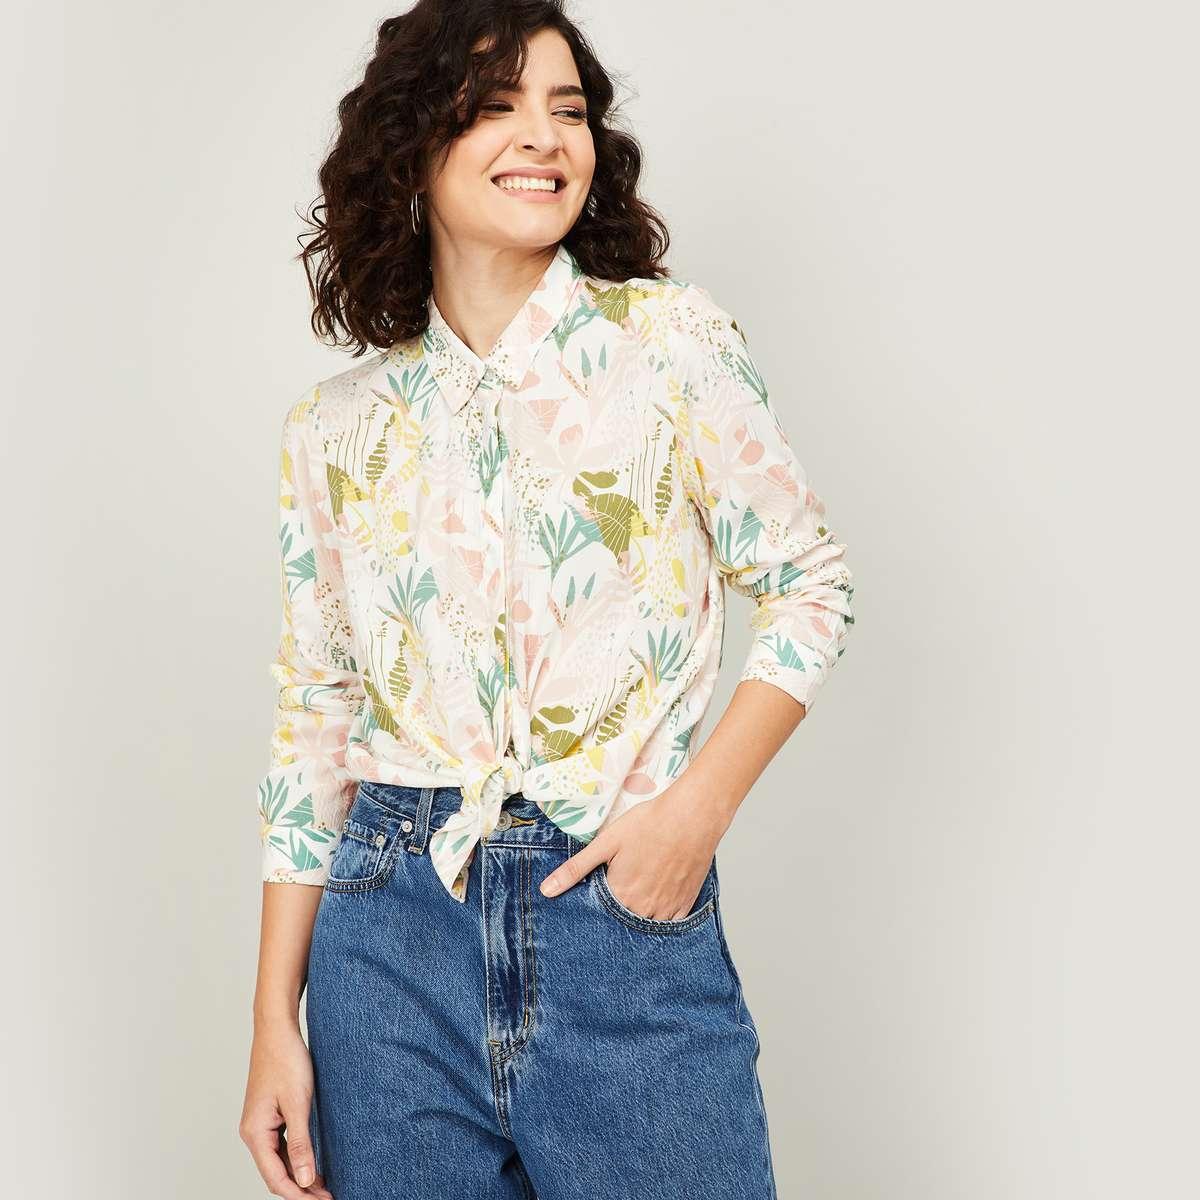 2.VERO MODA Women Floral Printed Regular Fit Shirt